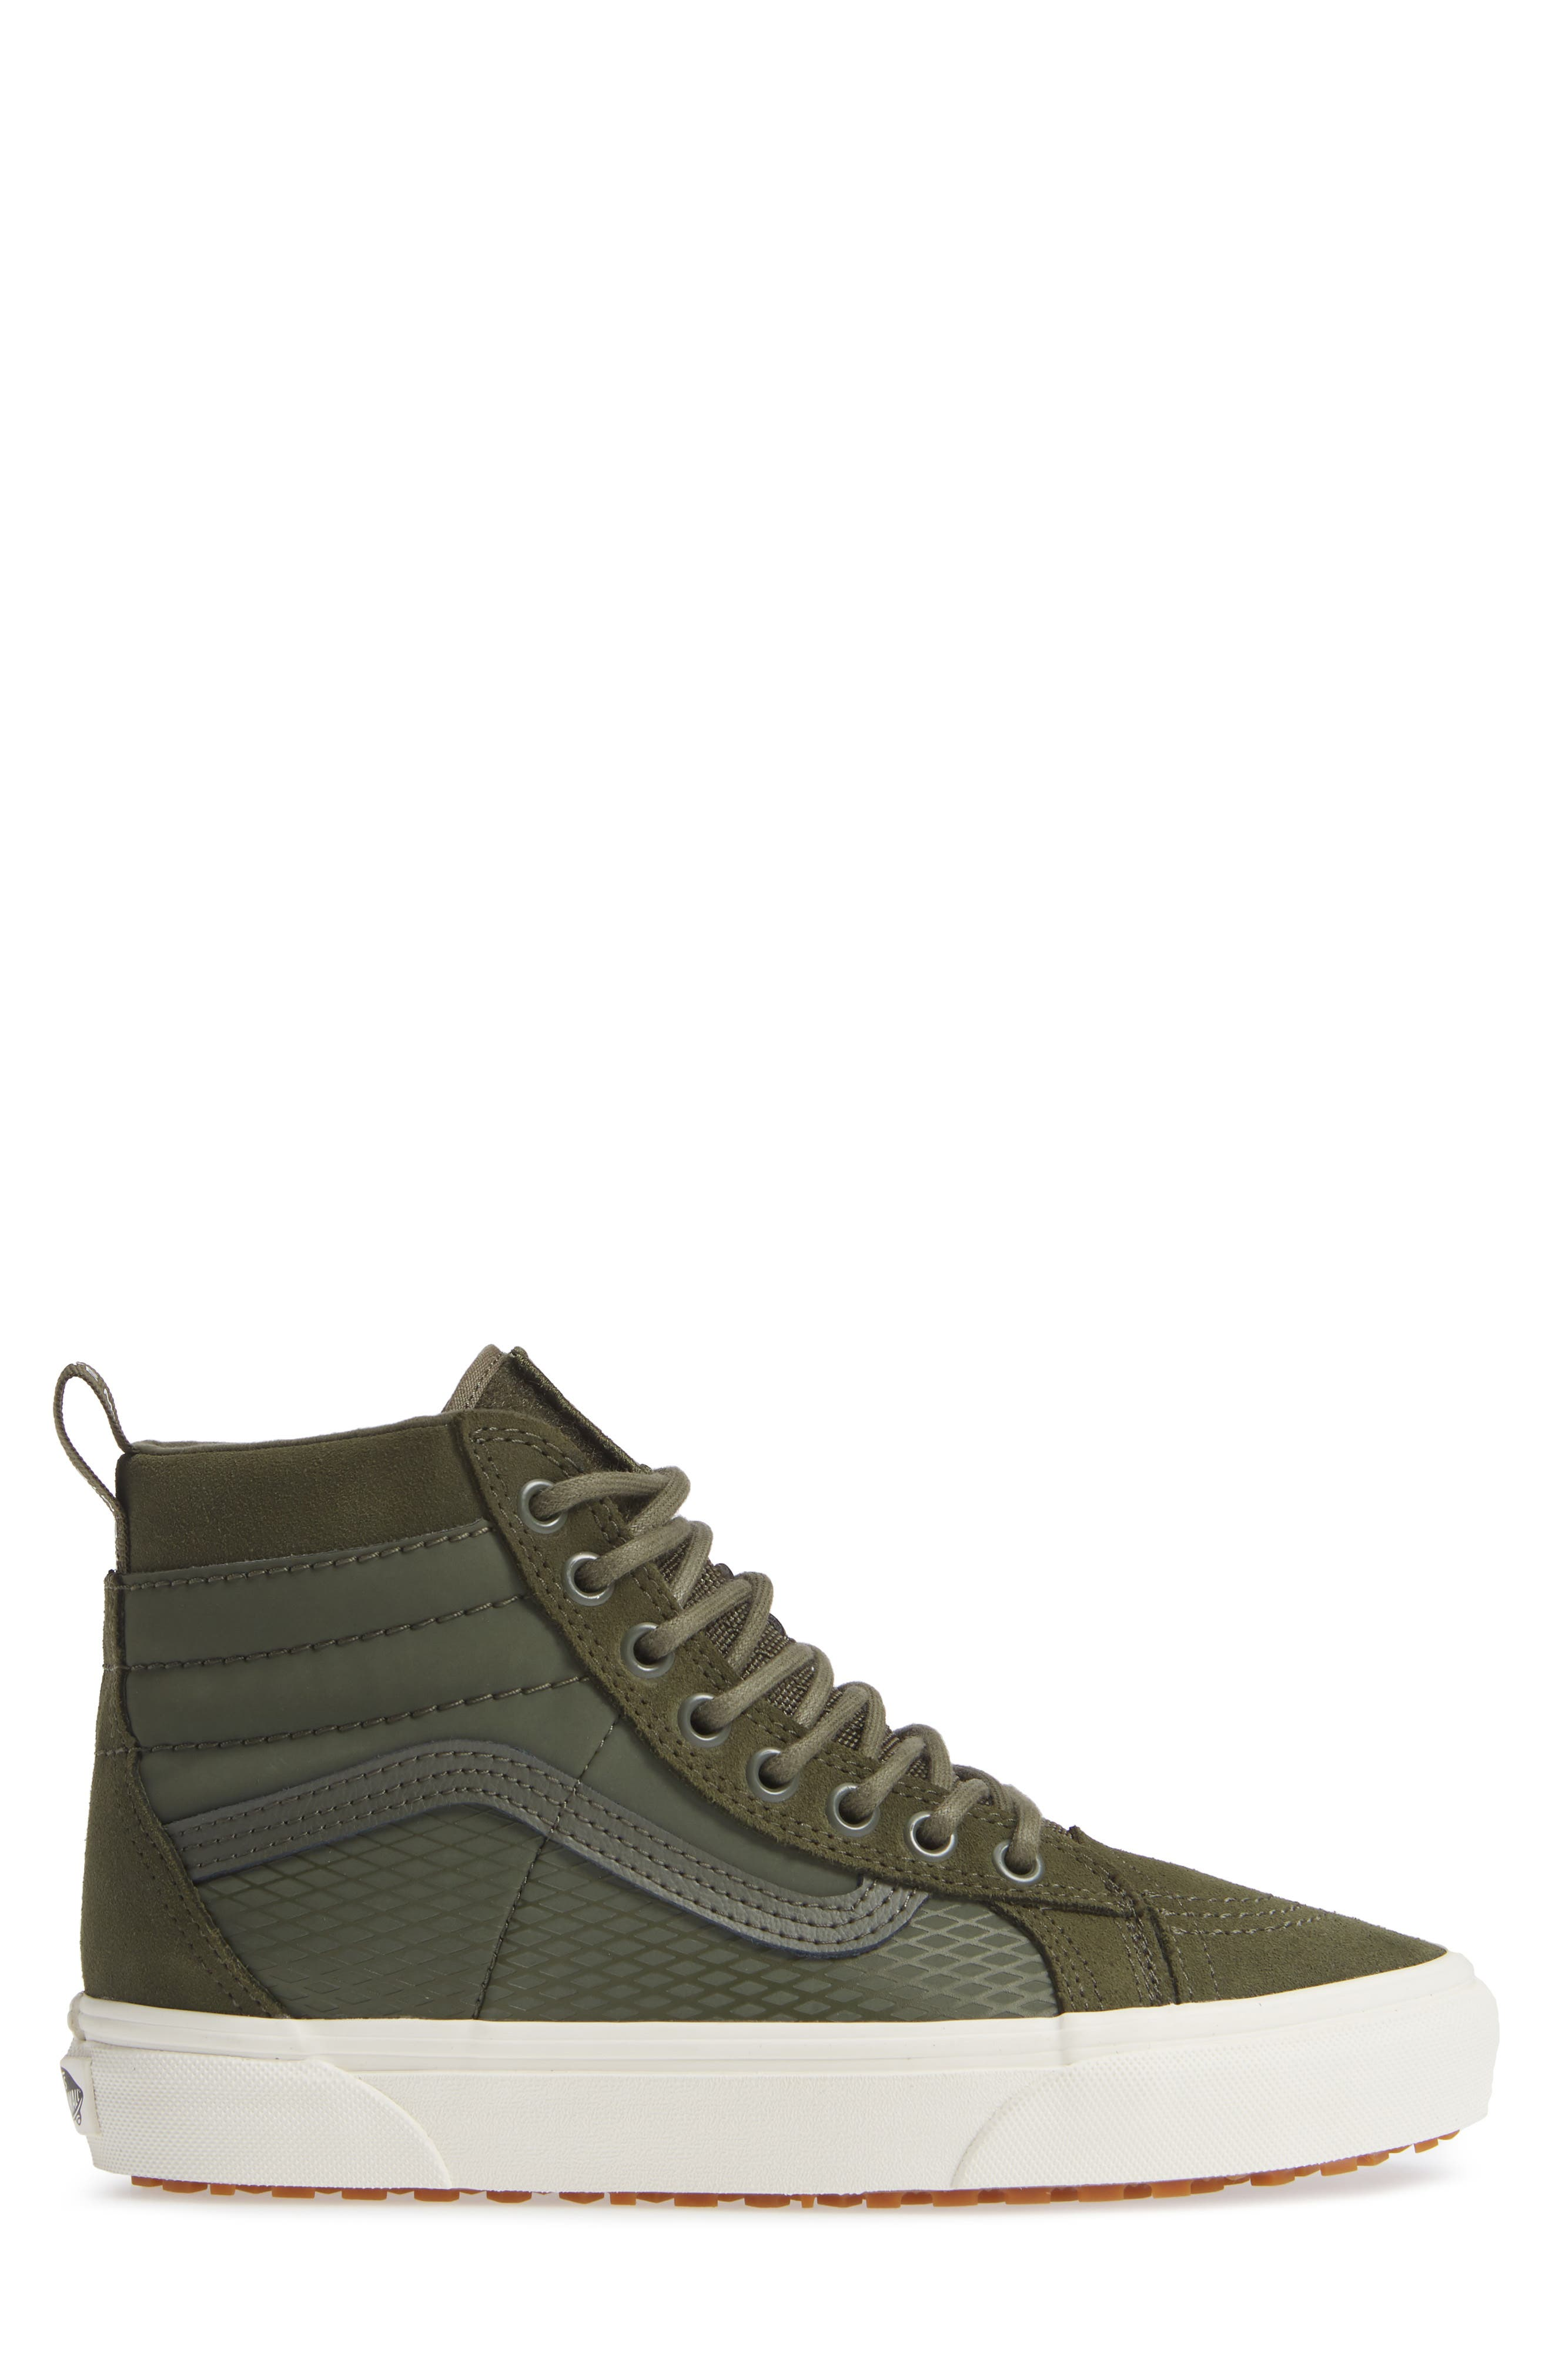 Sk8-Hi 46 MTE DX Sneaker,                             Alternate thumbnail 3, color,                             GRAPE LEAF